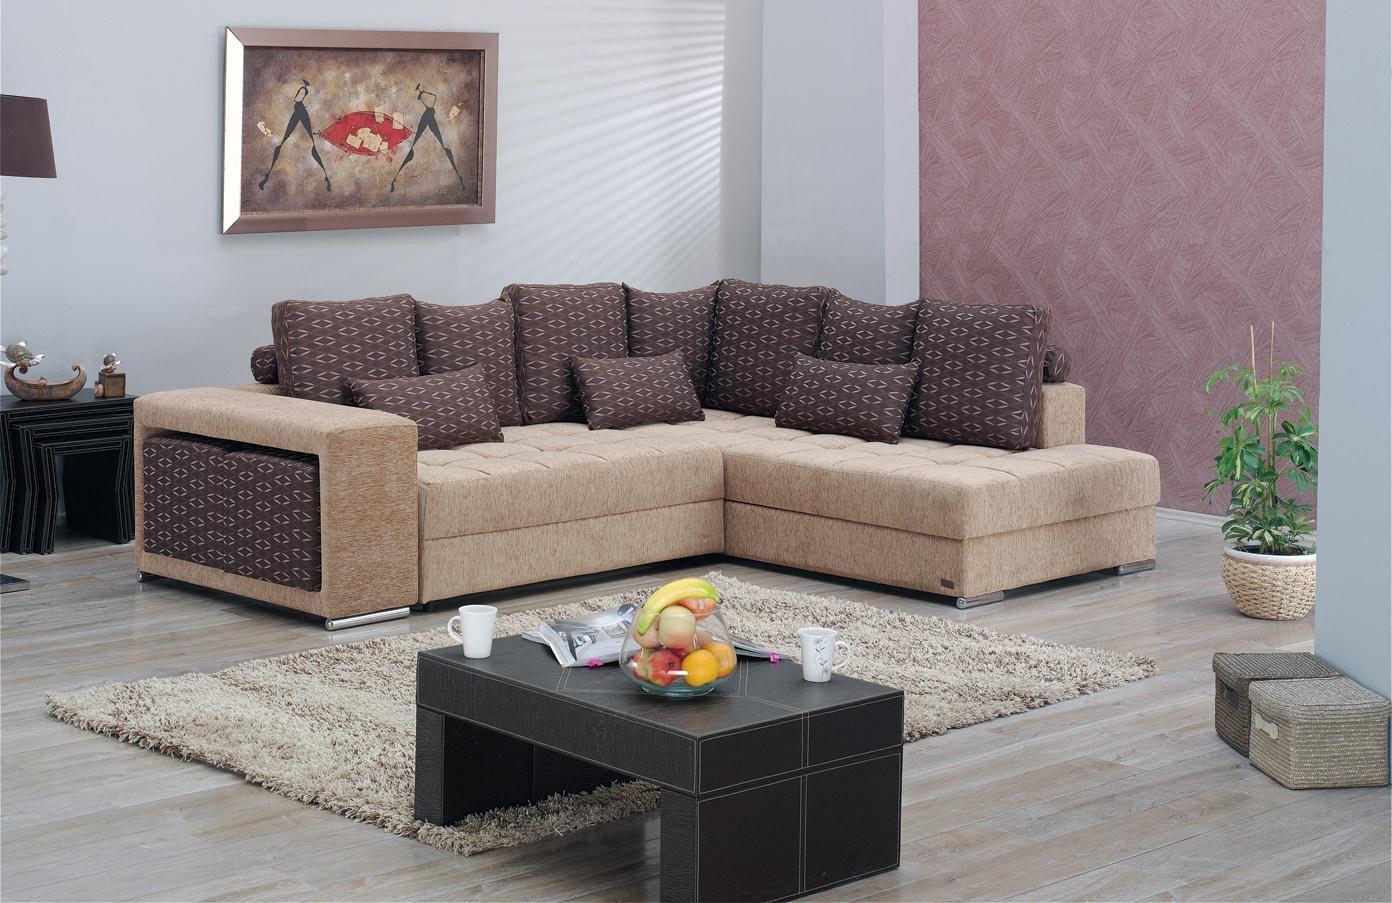 Los Angeles Sectional Sofa Setempire Furniture Usa Within Sectional Sofas Los Angeles (Image 14 of 20)